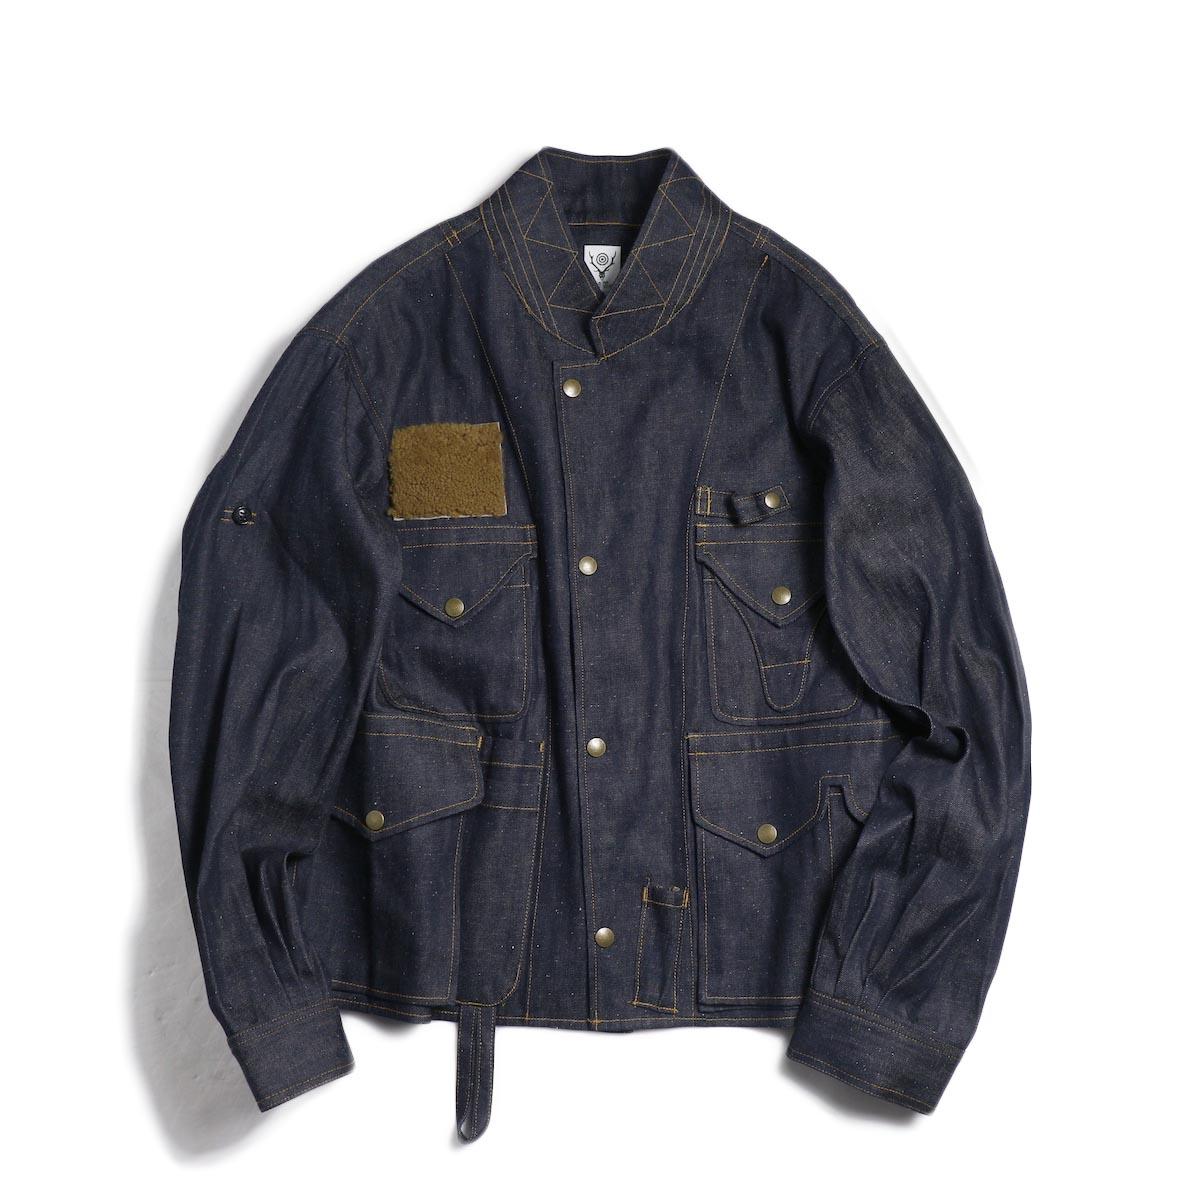 SOUTH2 WEST8 / E.H. Fishing Jacket -C/L 8.5oz Denim